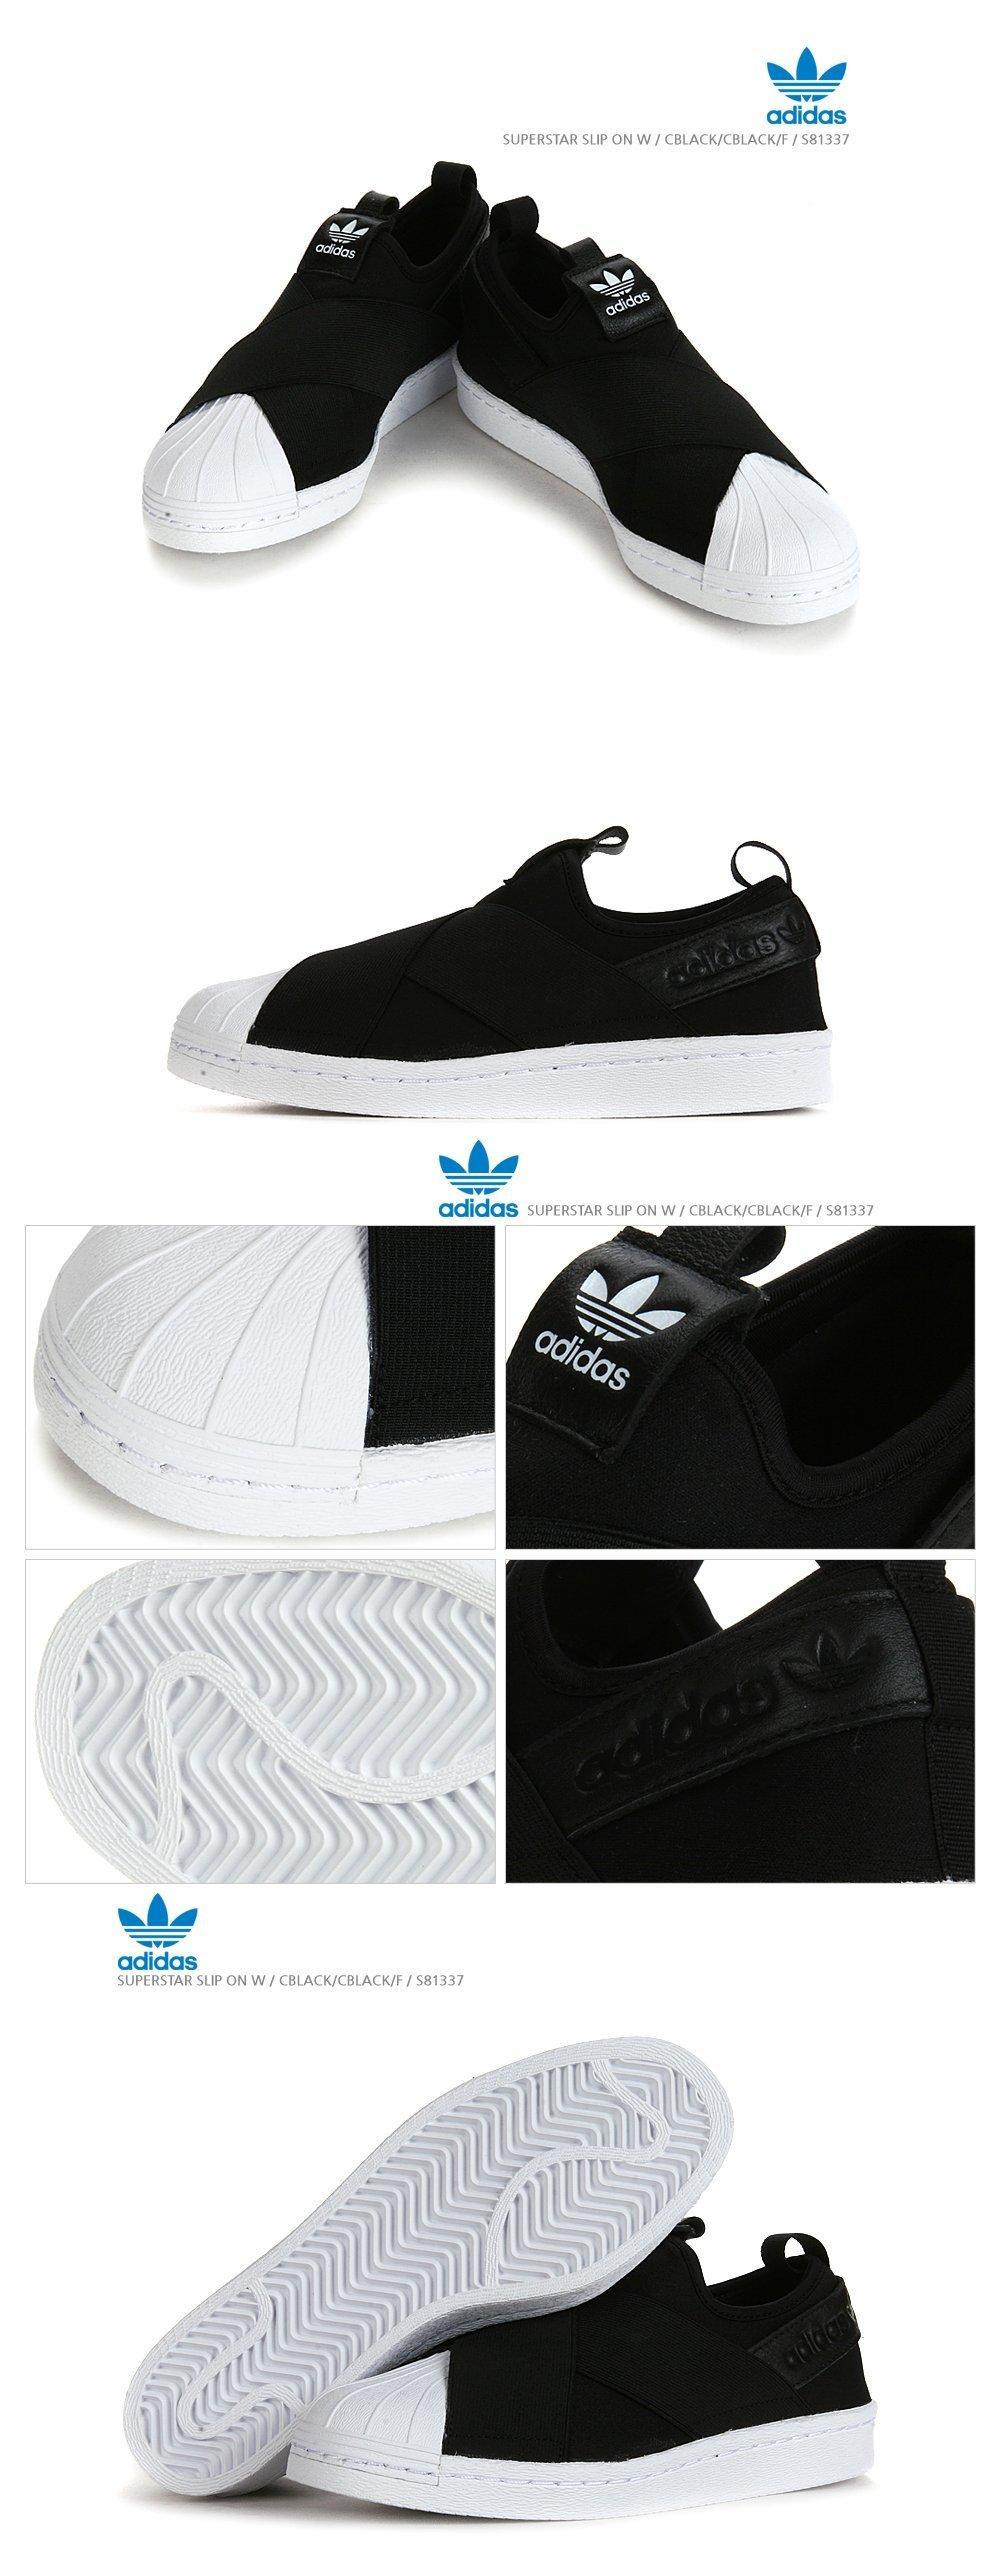 new concept 327c2 bf614 Adidas Originals Superstar Slip-on Shoes S81337 Black/White